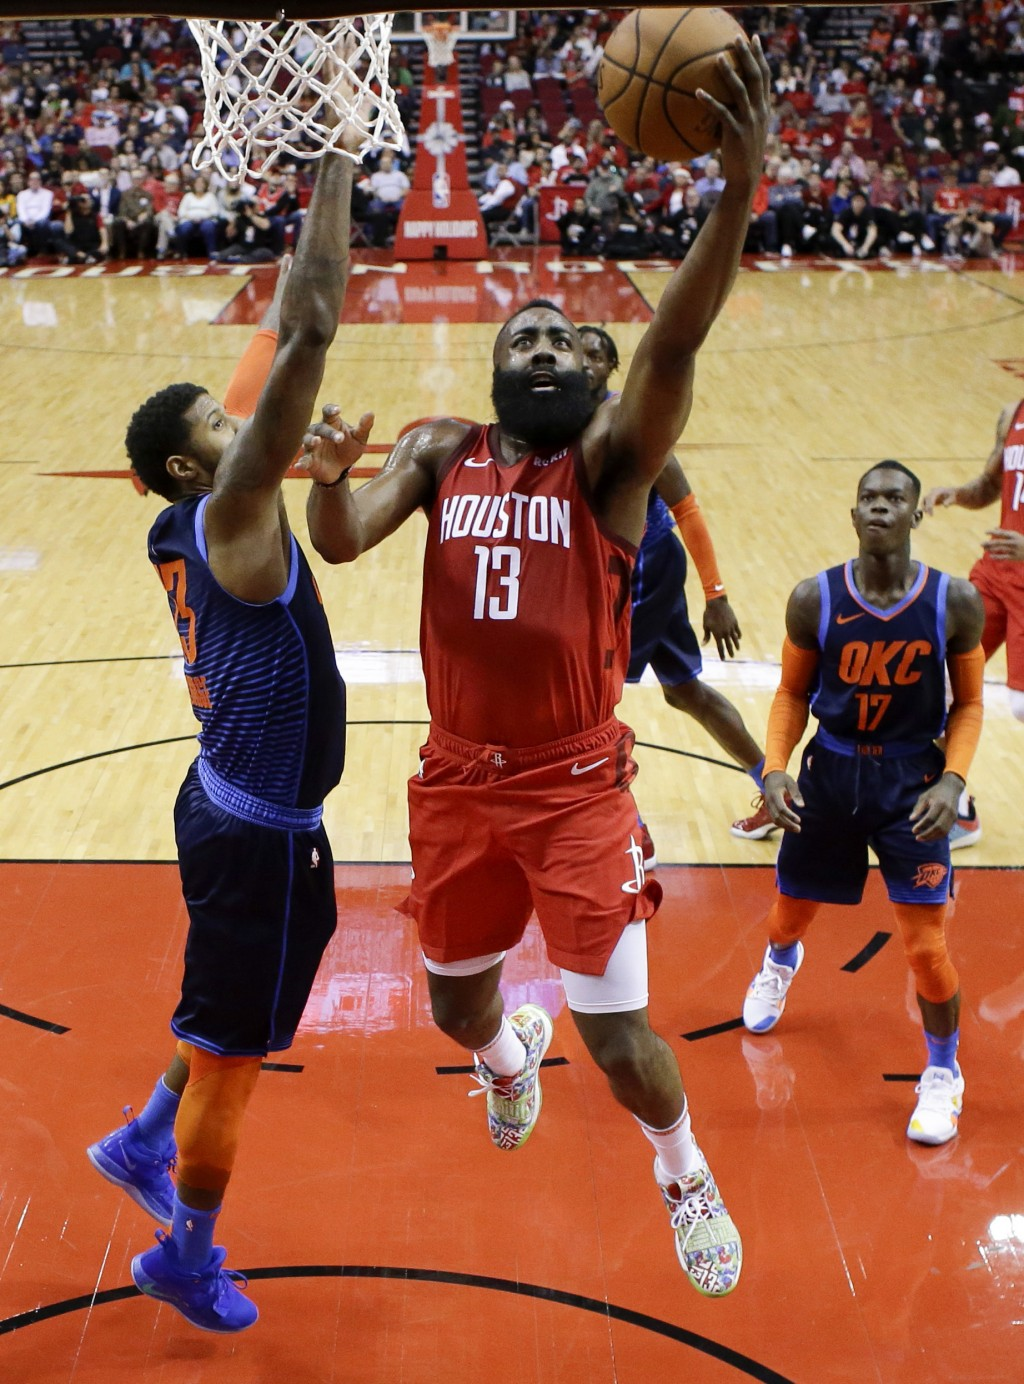 1585e20c855f Harden s 41 helps Rockets over Thunder 113-10...